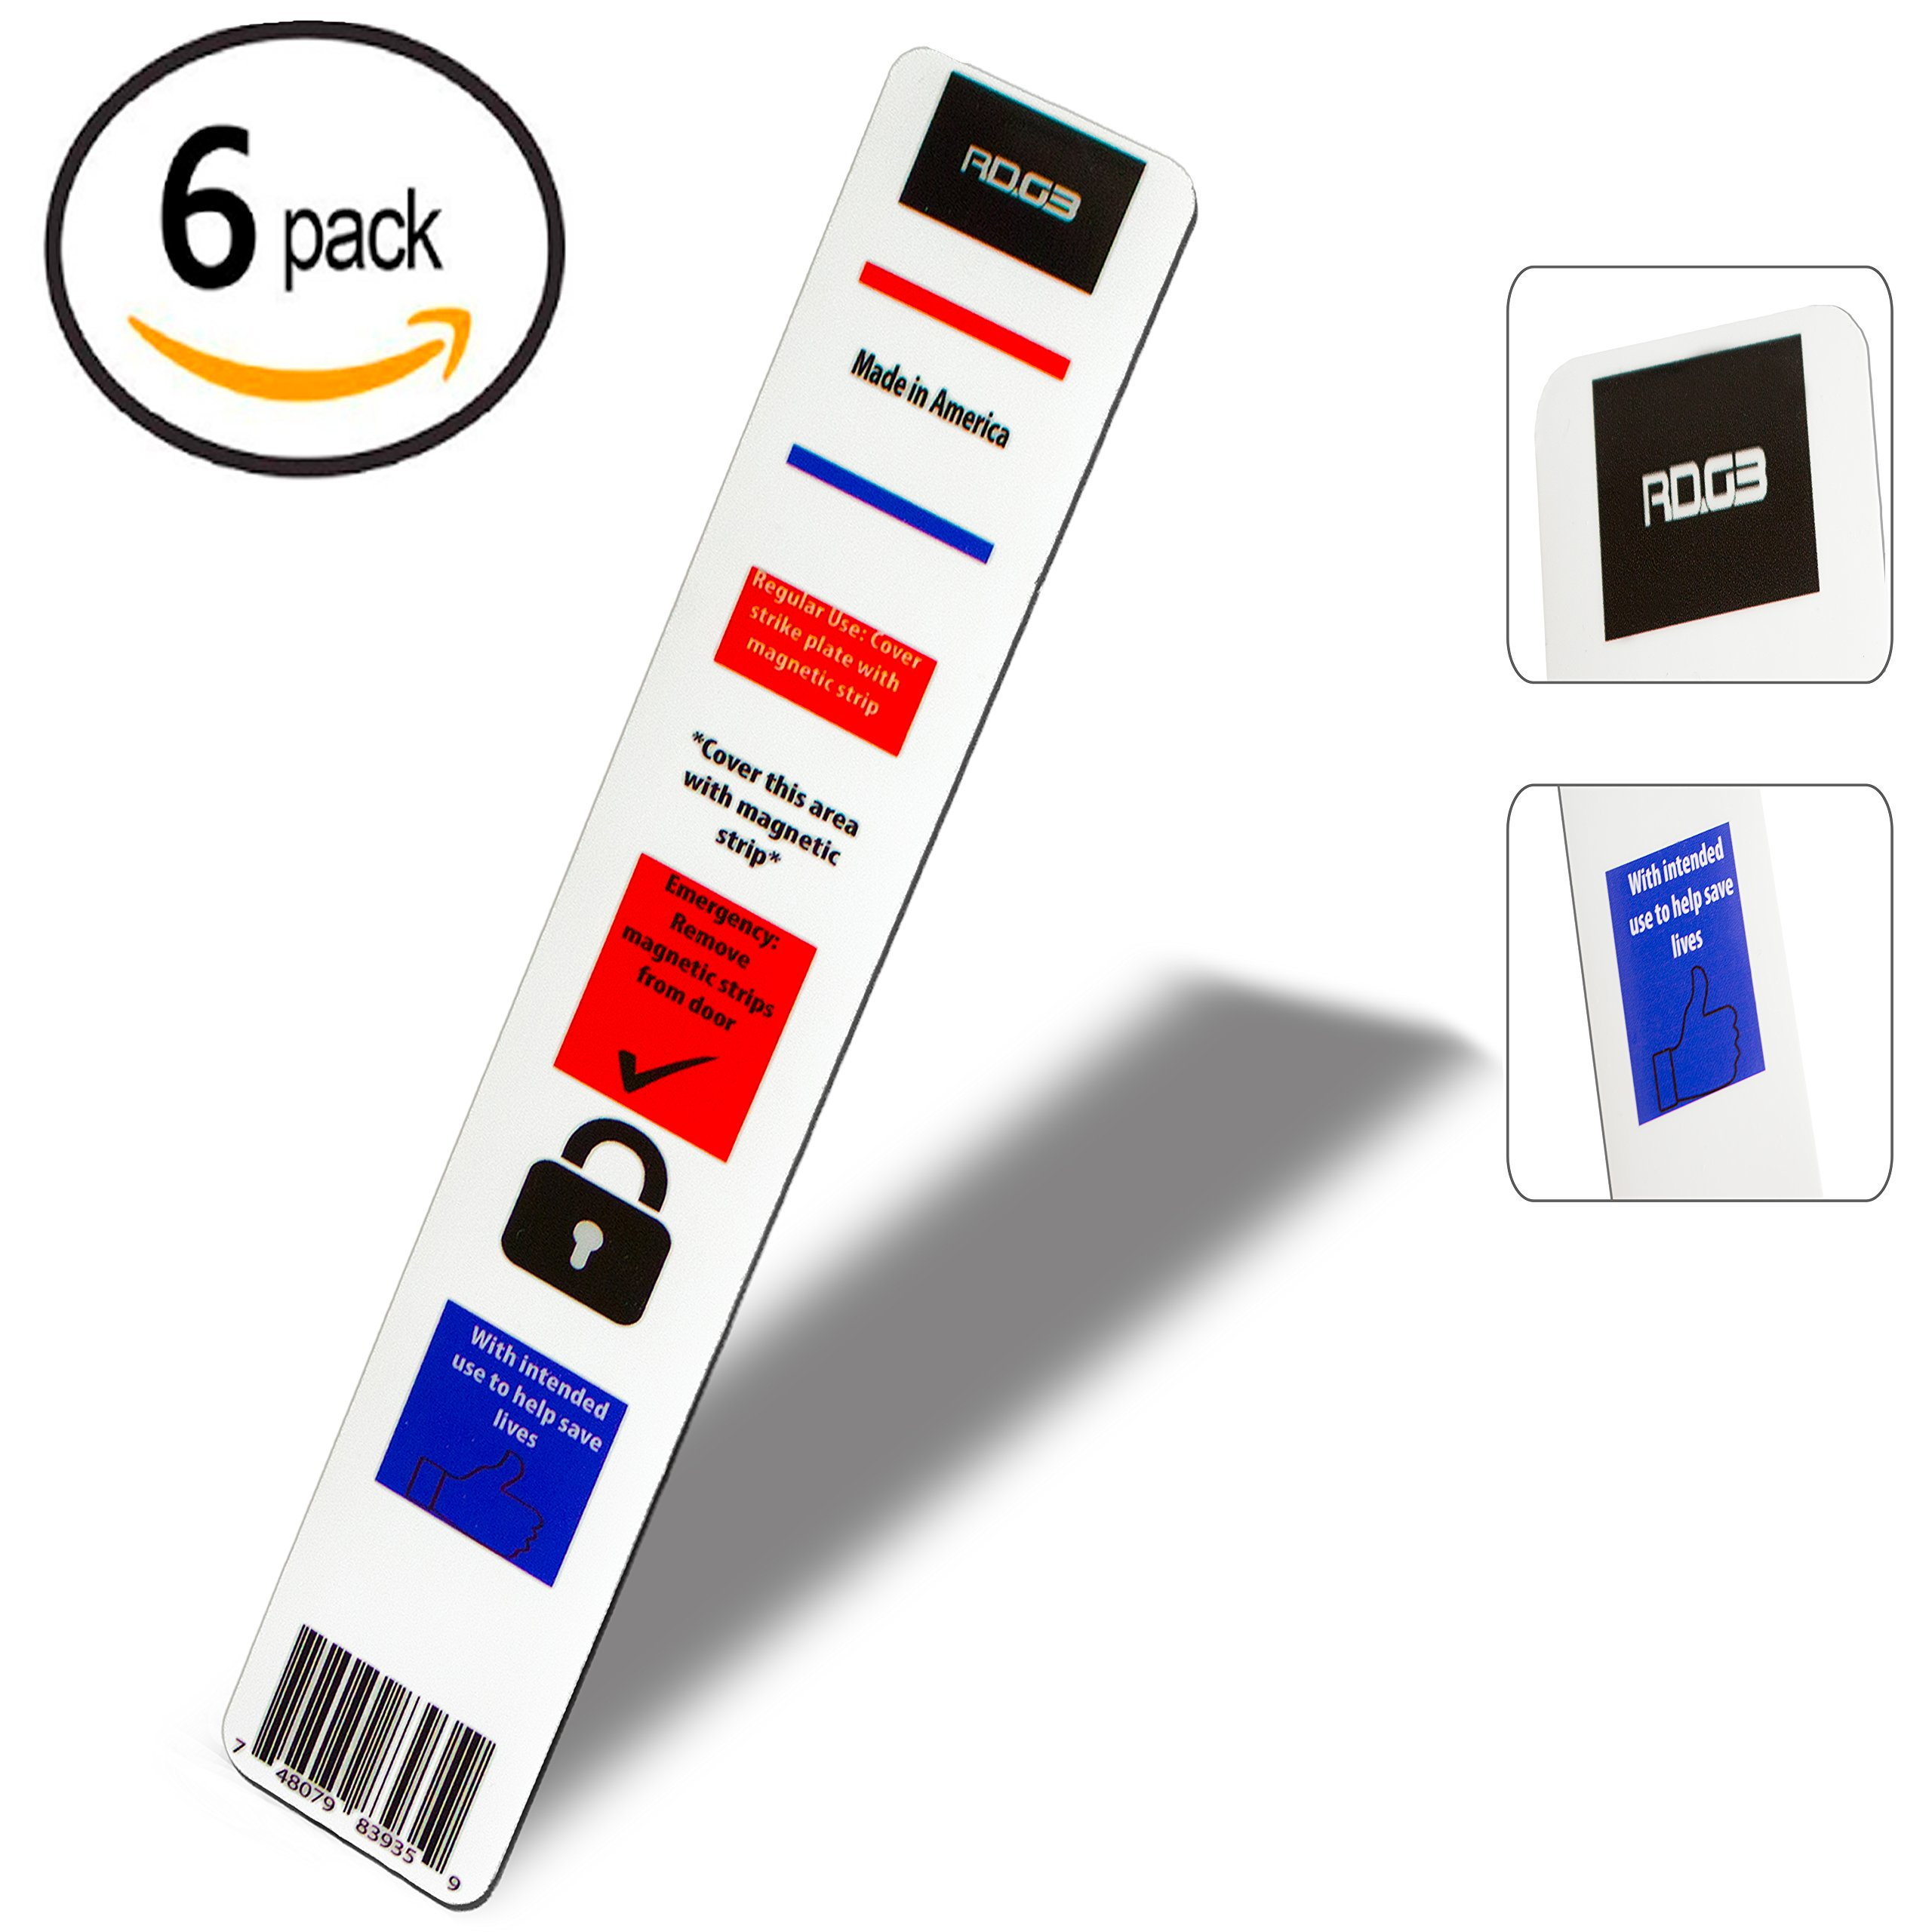 Get Quotations 6 Pack Magnet Lock Strip For Door Intruder Defense System Security School